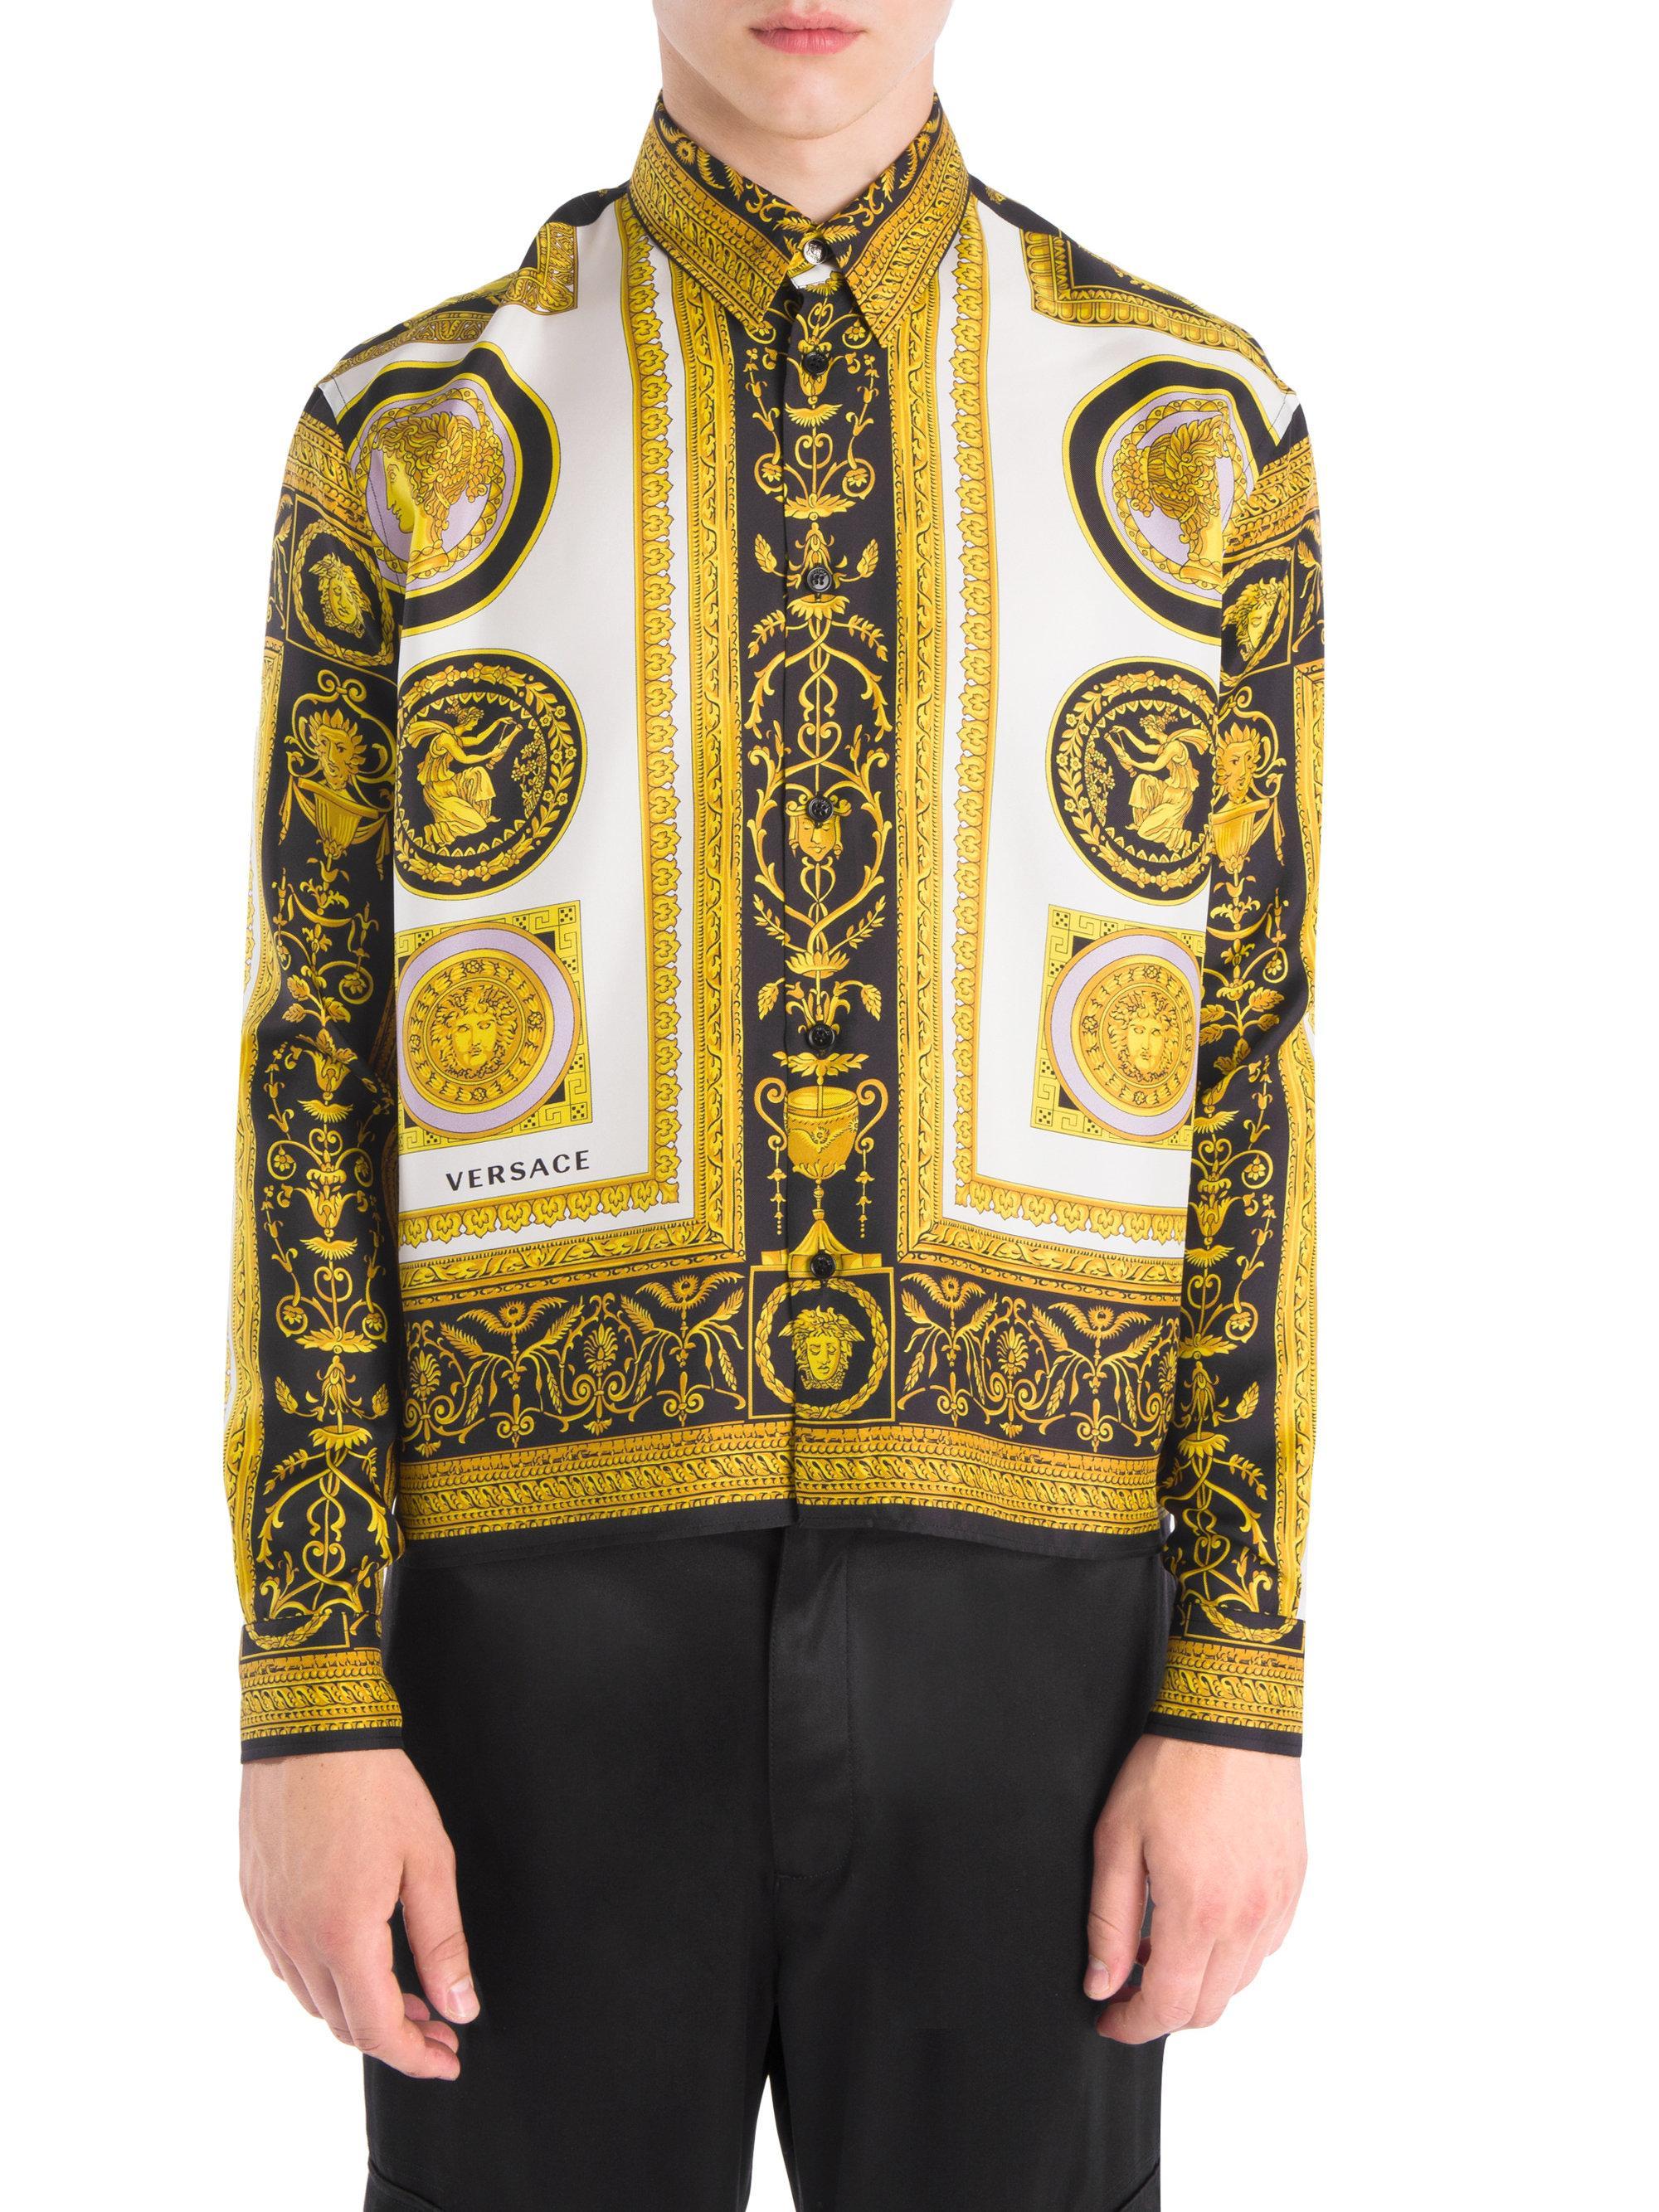 65024eaf0bfda9 ... Lyst Versace Logo print Silk Button down Shirt in Black for Men